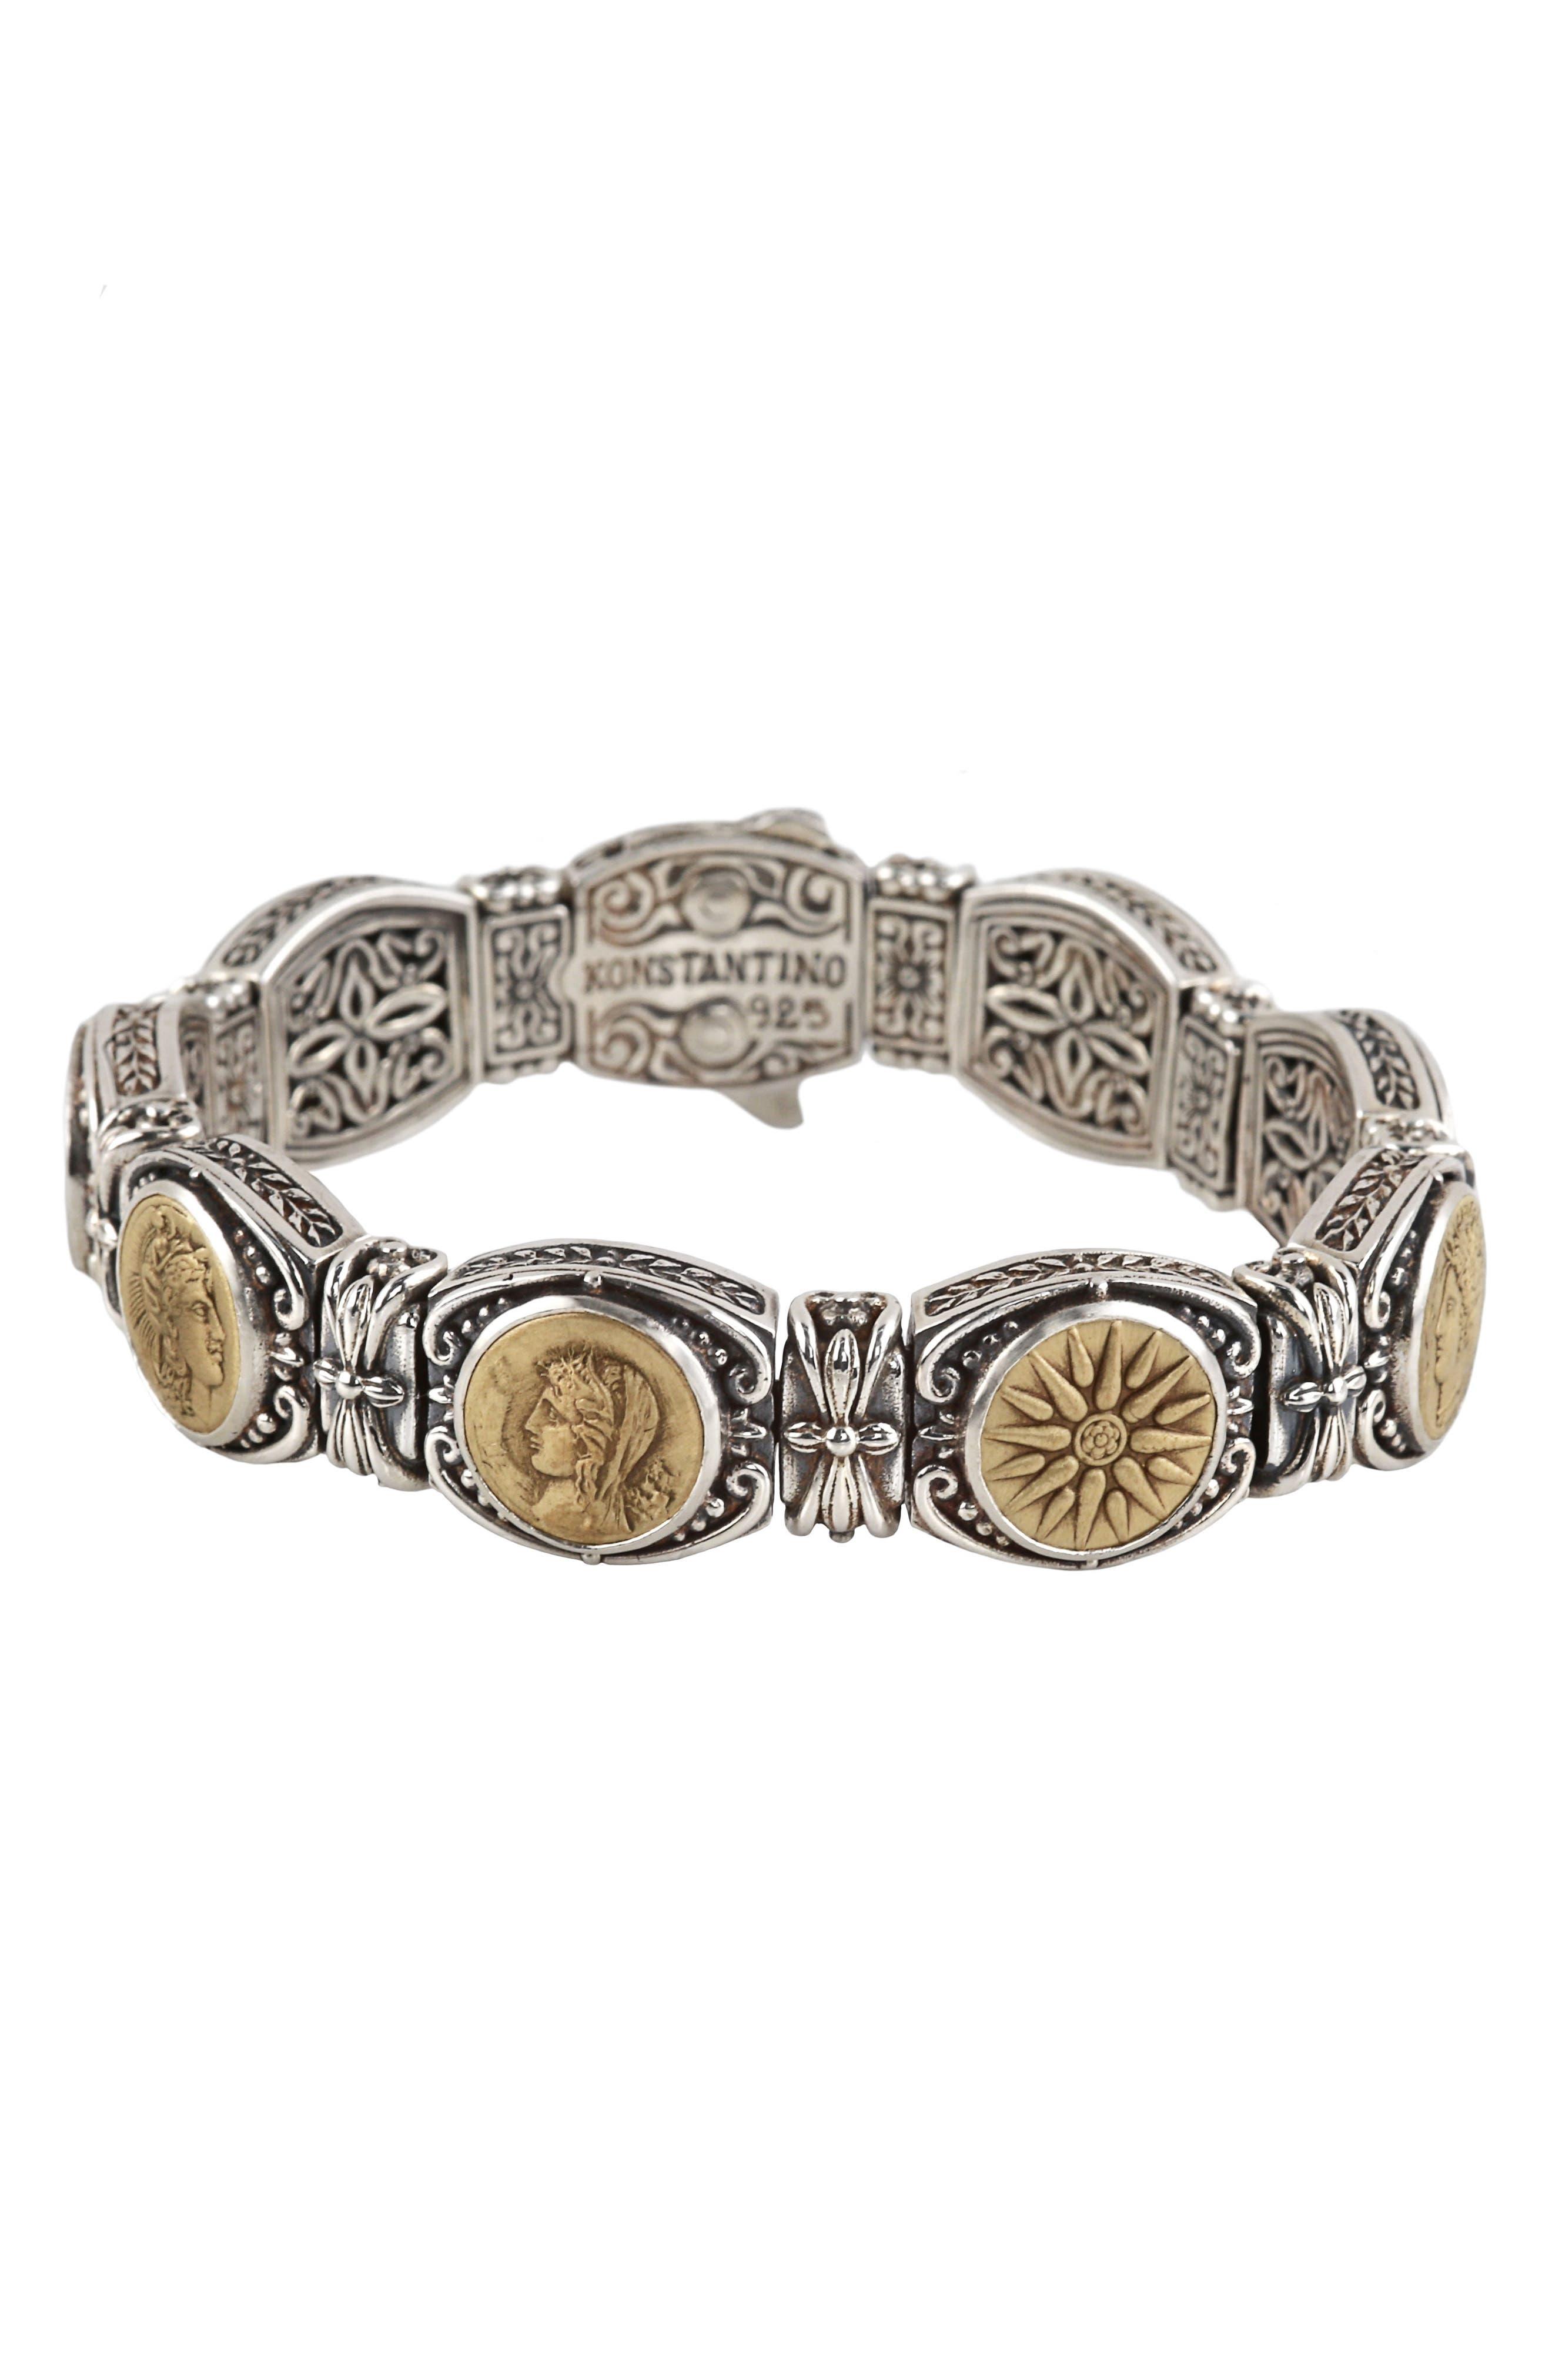 KONSTANTINO Bronze Coin Bracelet